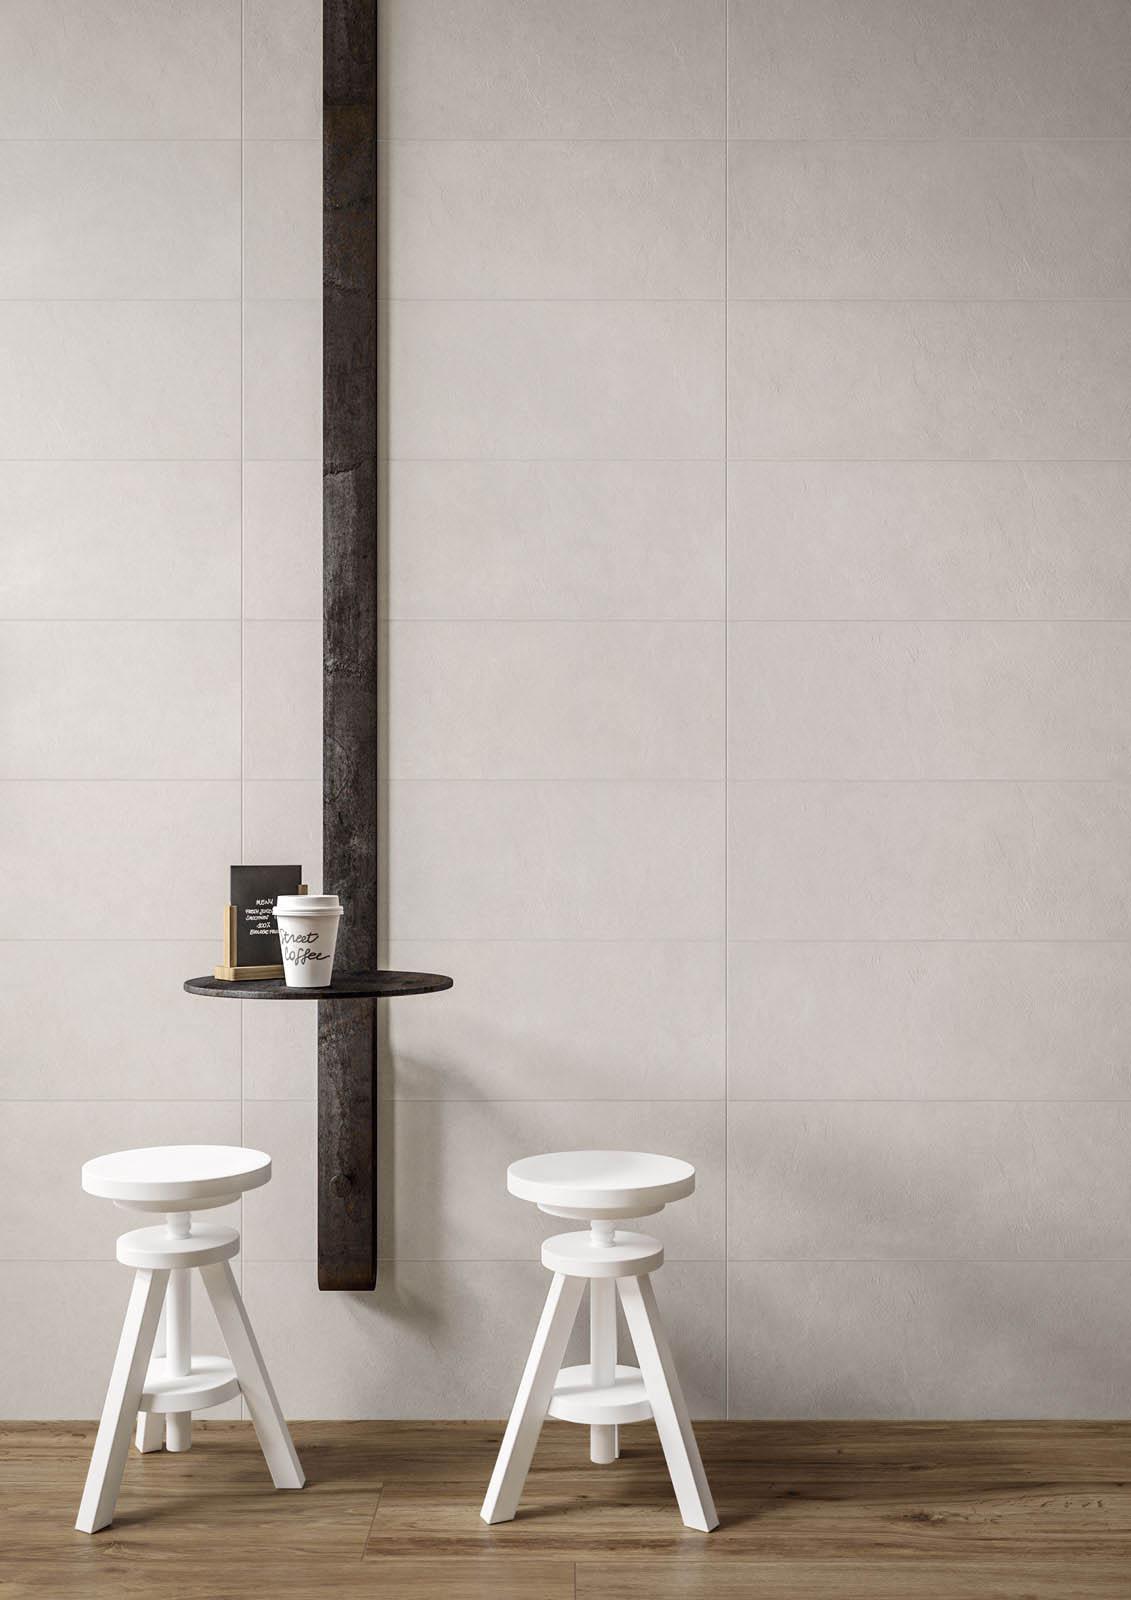 Rev tements muraux cuisine salle de bain douche marazzi - Revetements muraux pour salle de bain ...